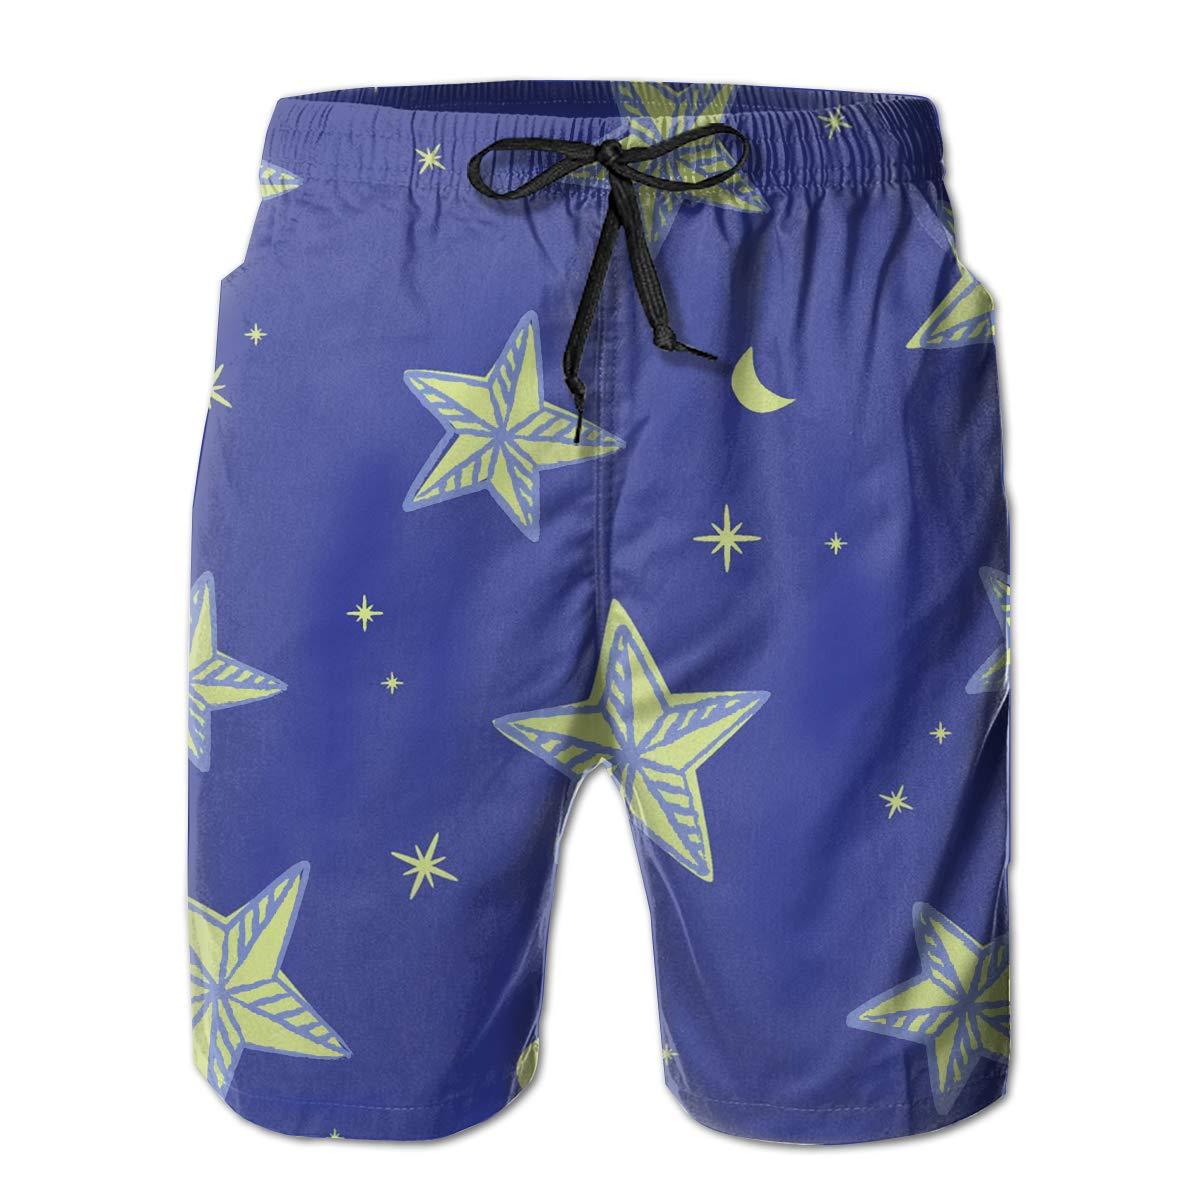 Blue Flag Star Mens Quick Dry Swim Trunks Beach Board Short Drawstring Vacation Surfing Shorts